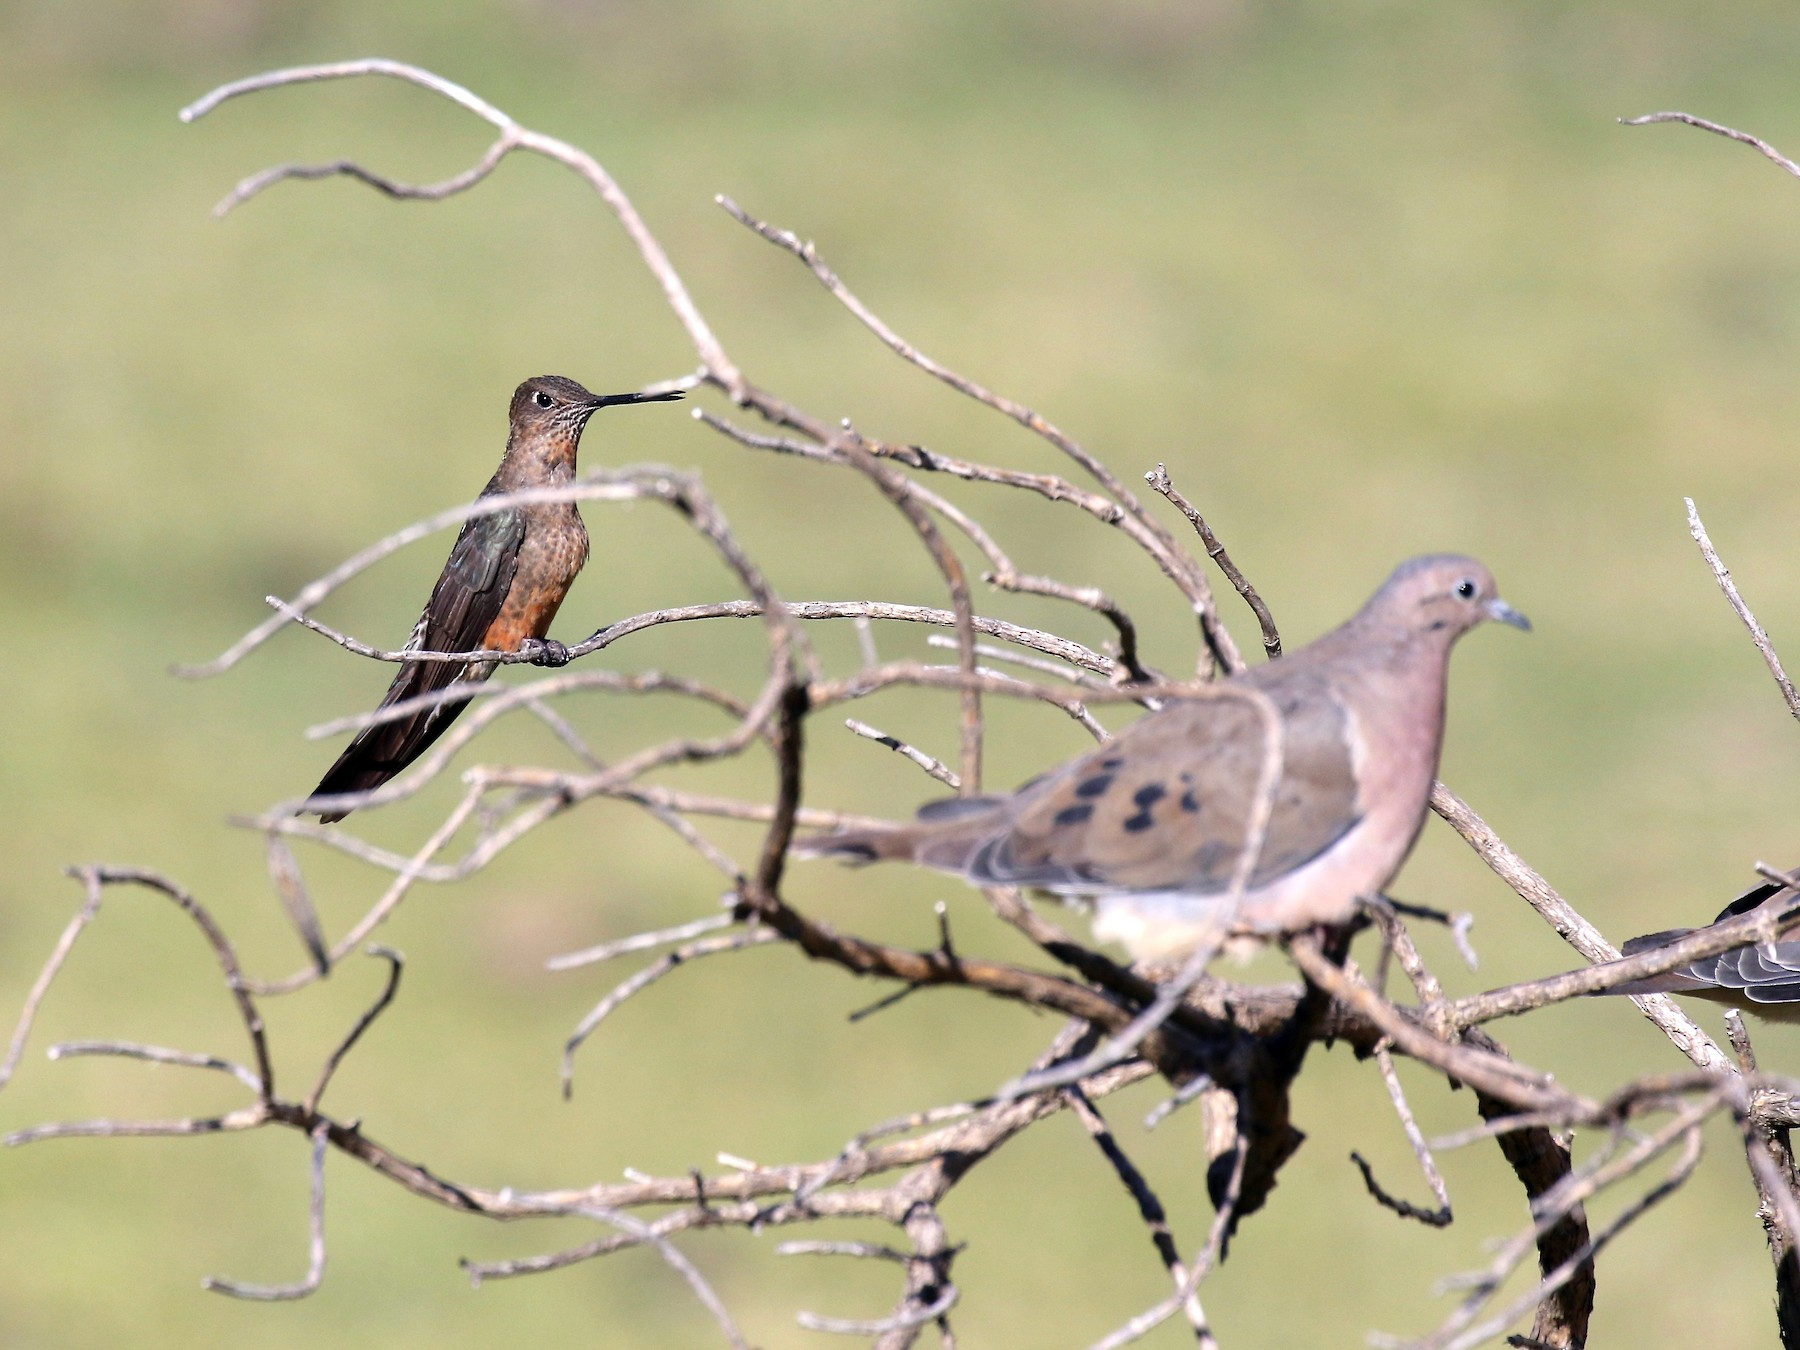 Giant Hummingbird - Jonah  Benningfield